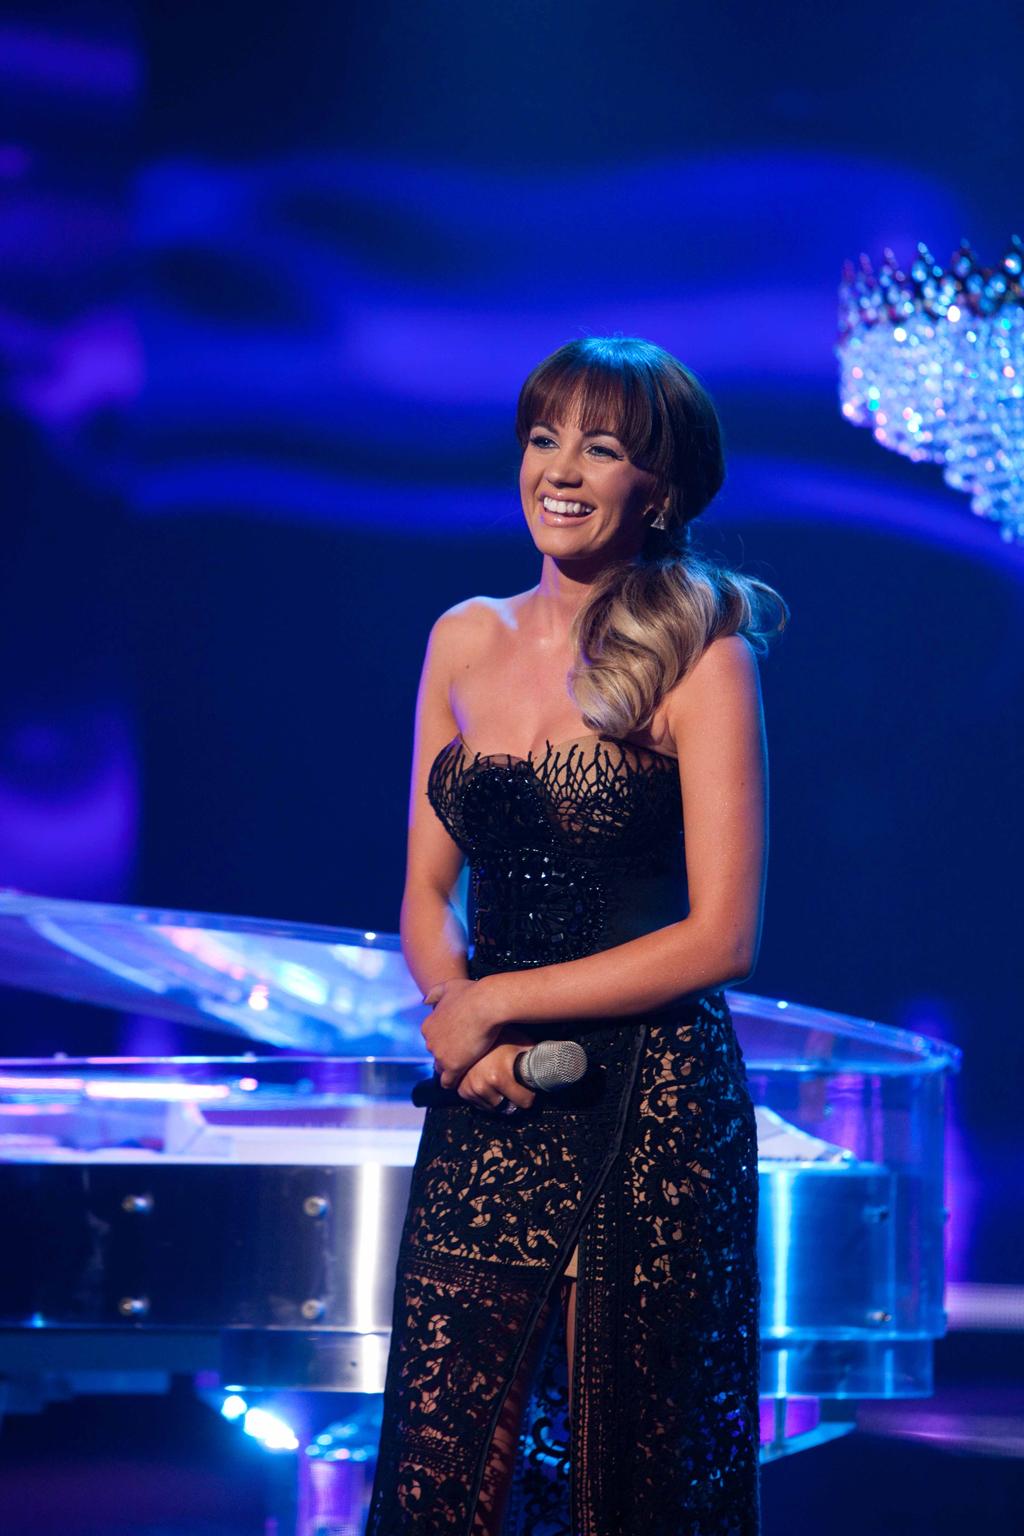 X Factor finalist Samantha Jade.